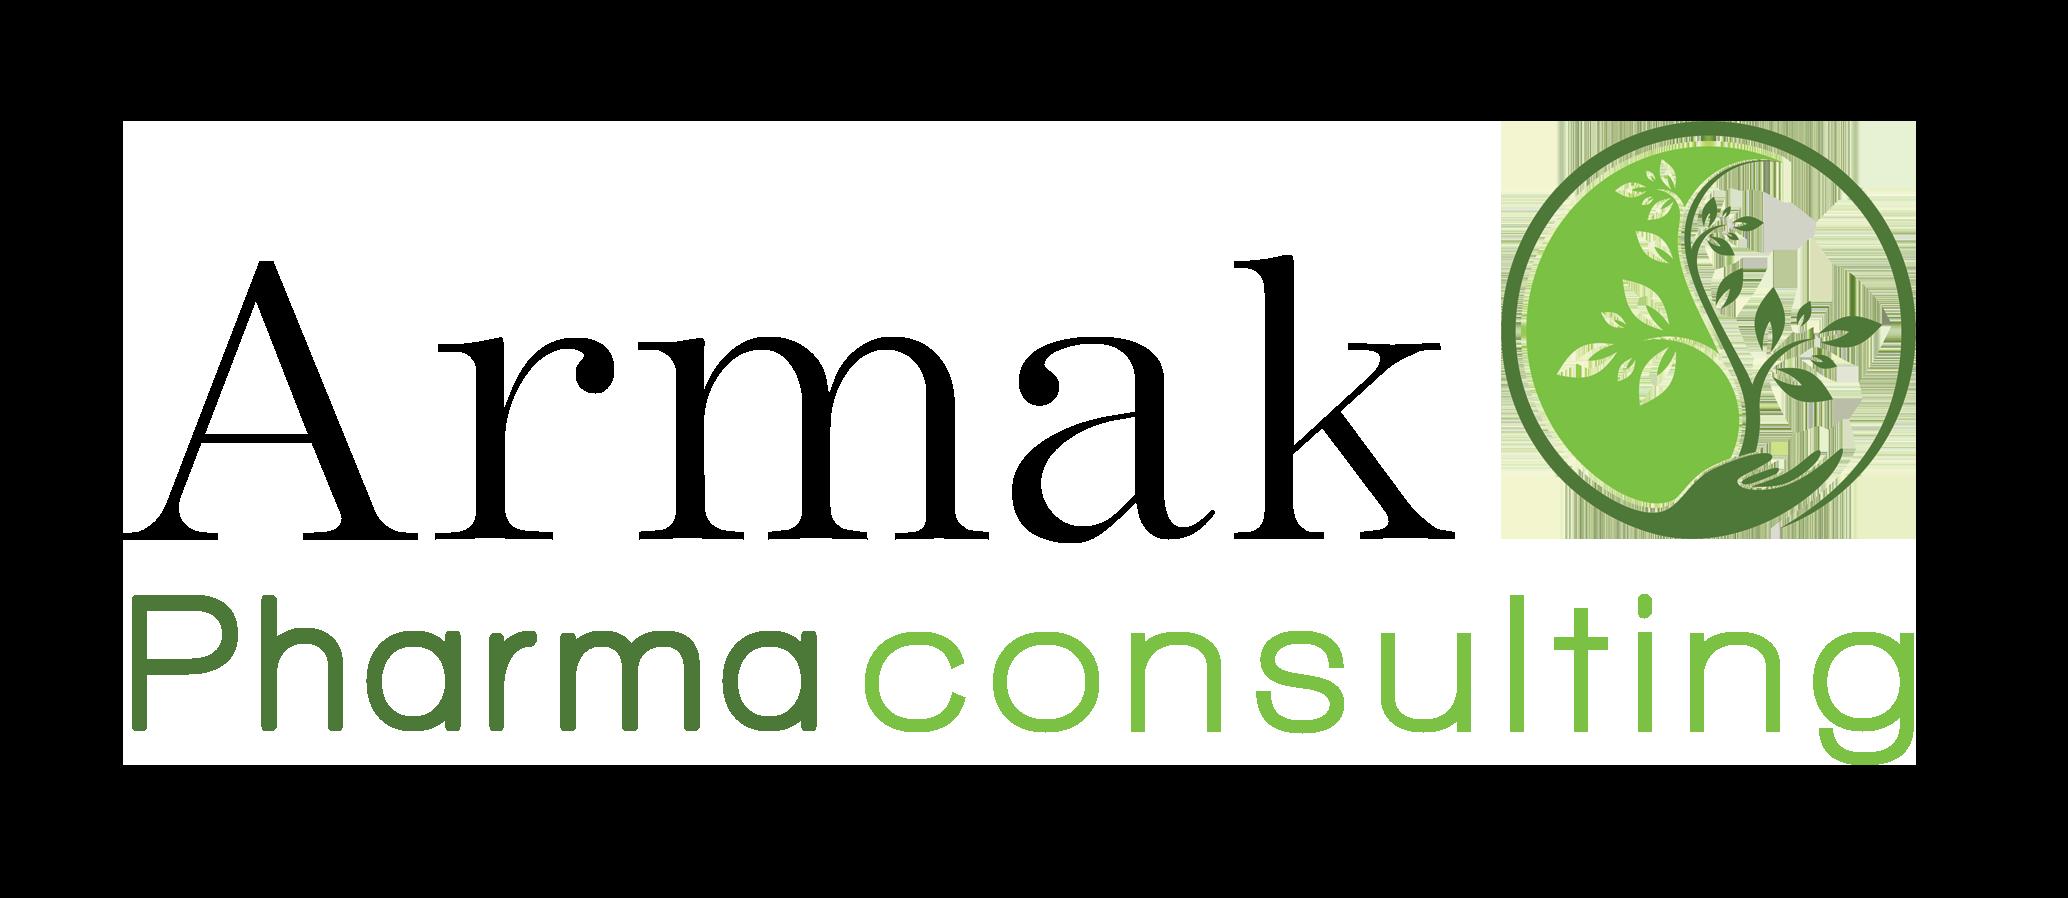 Armak Pharma Consulting